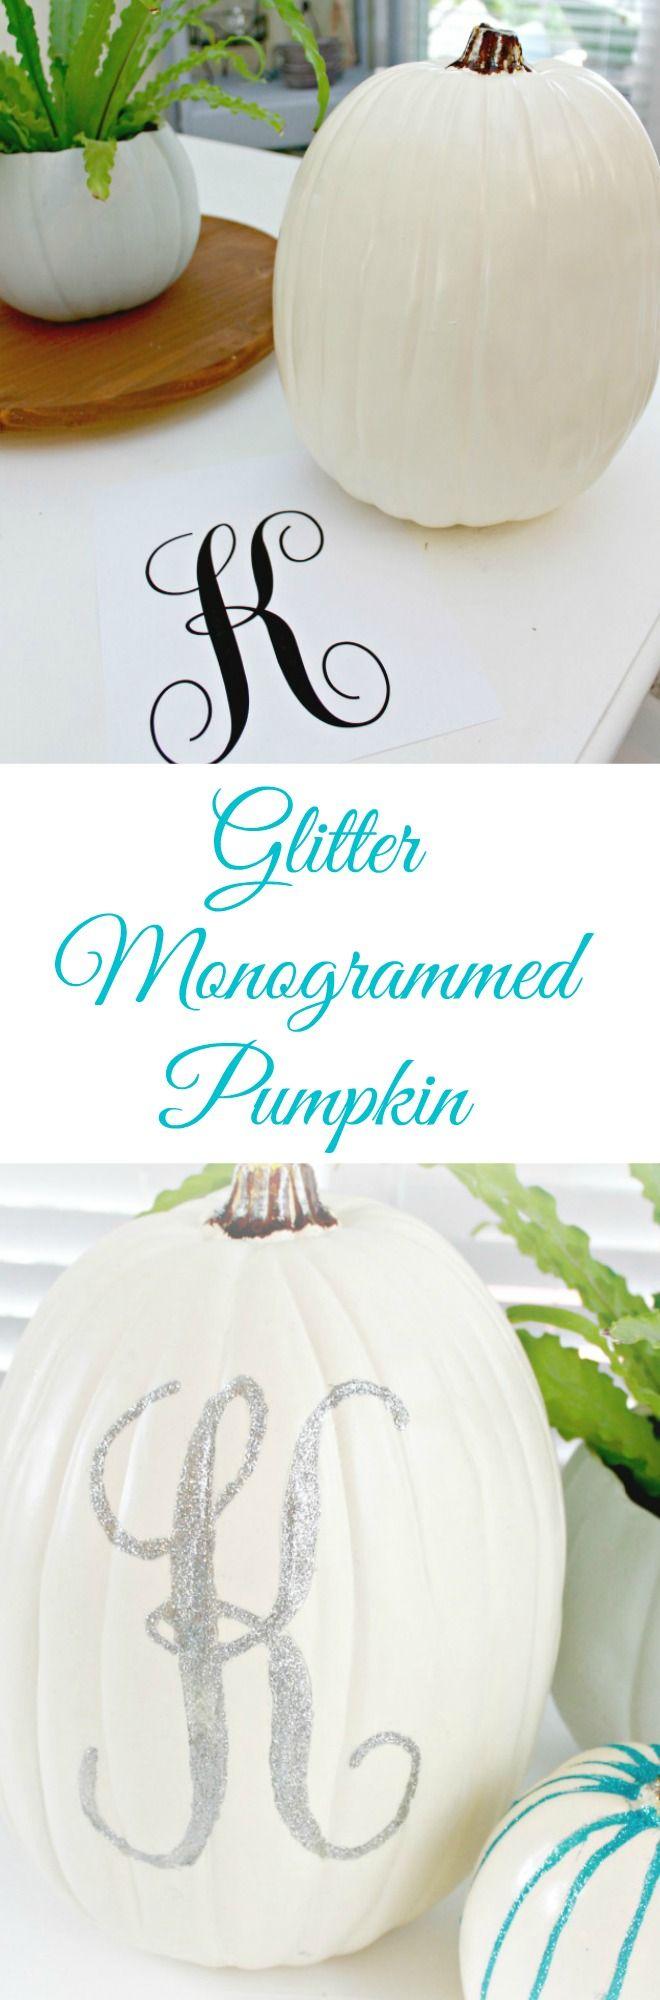 Glitter Monogrammed Pumpkin - Simple Fall Decor Idea Using a Faux Plastic Pumpkin!